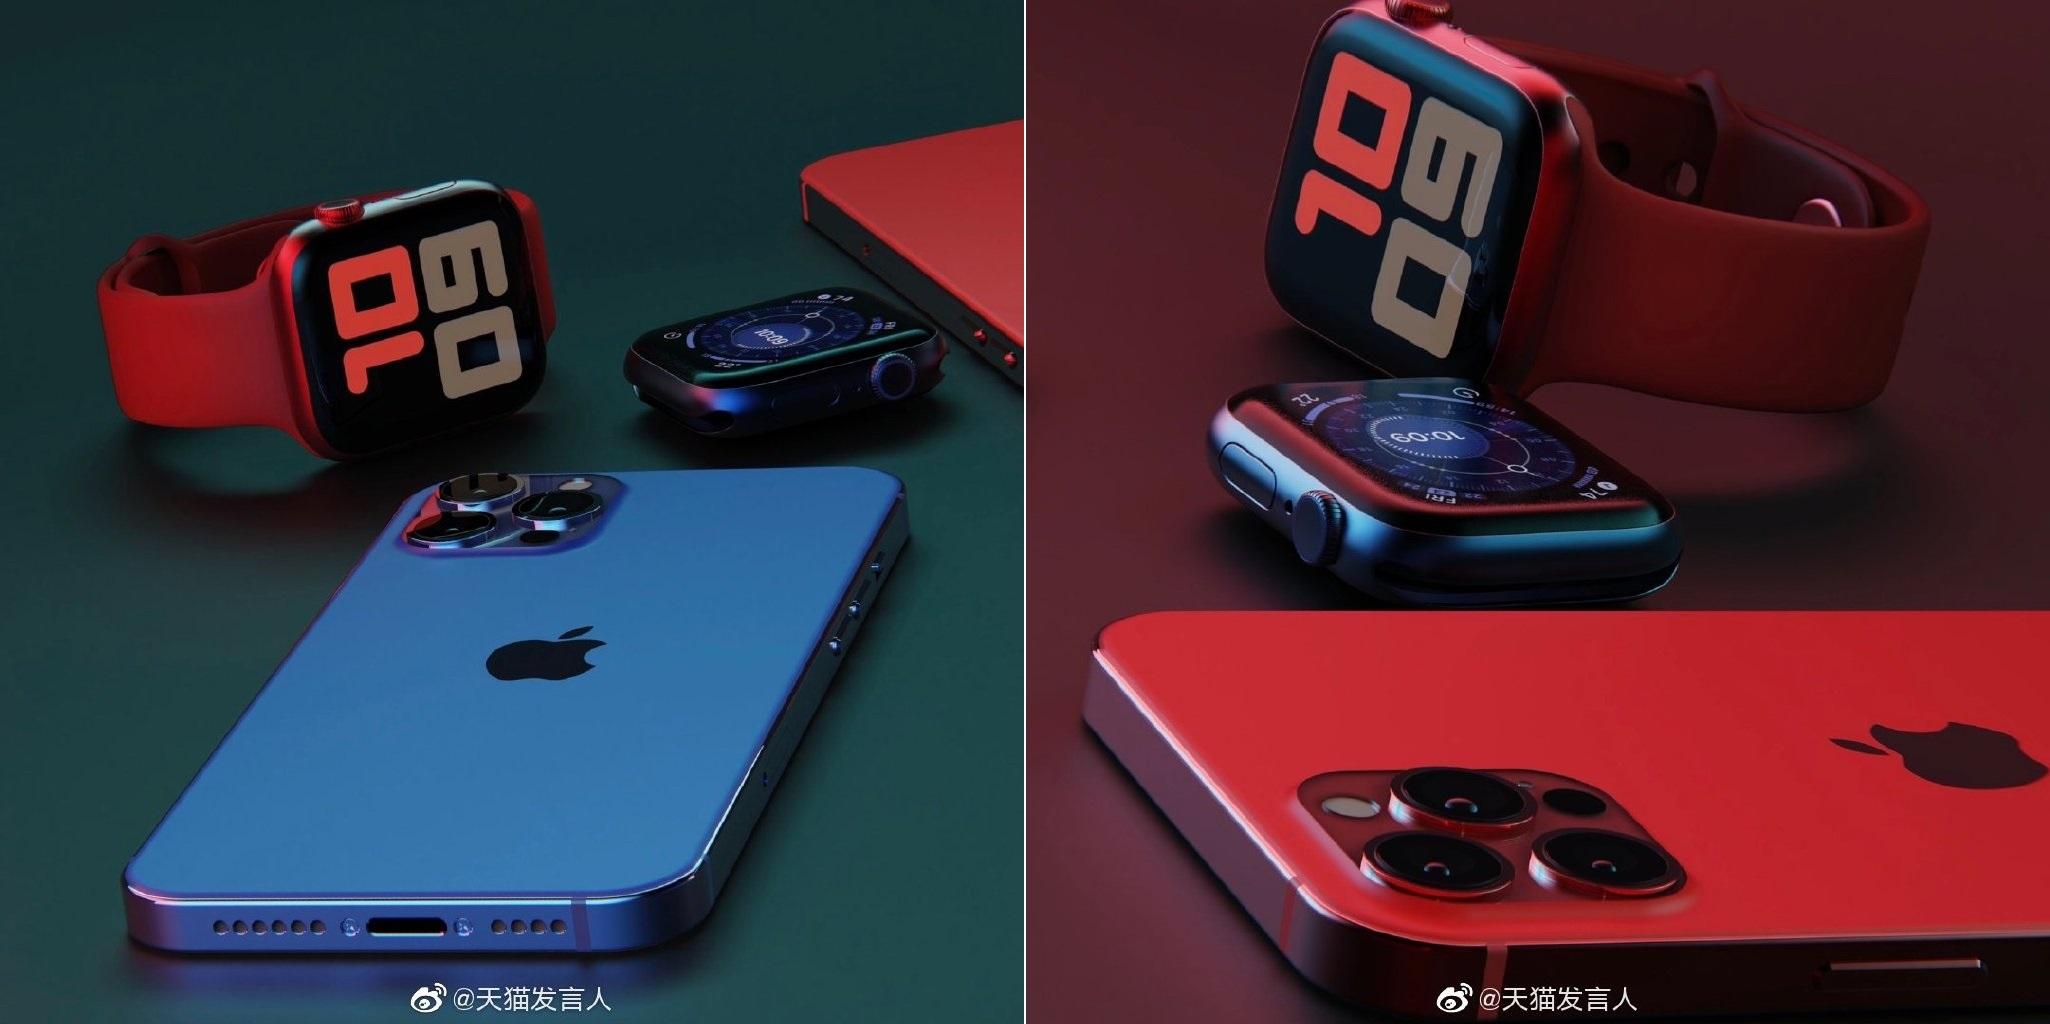 Варианты расцветки iPhone 12